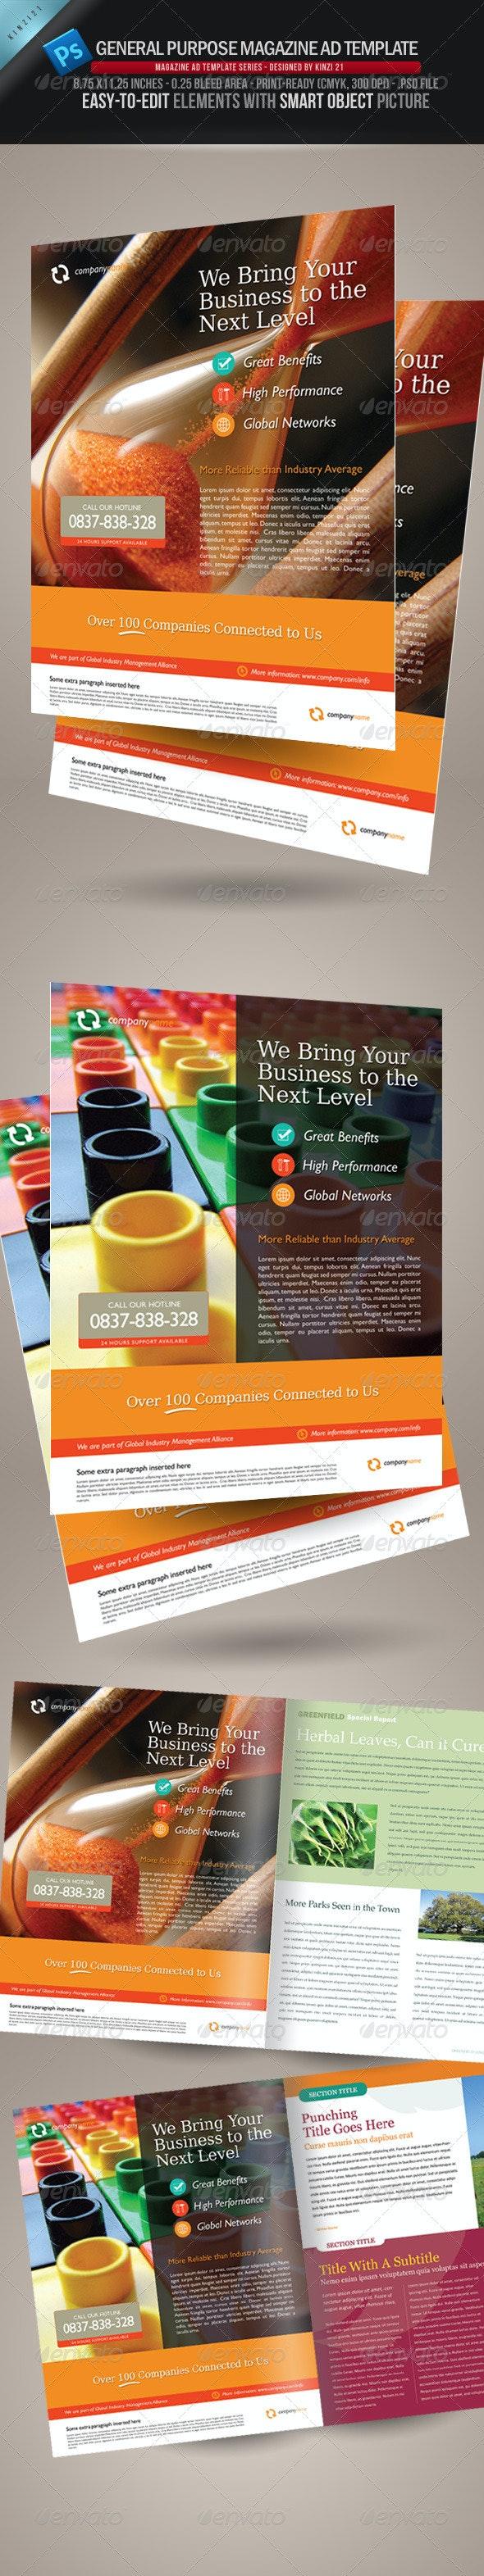 General Purpose Magazine Ad Template - Magazines Print Templates